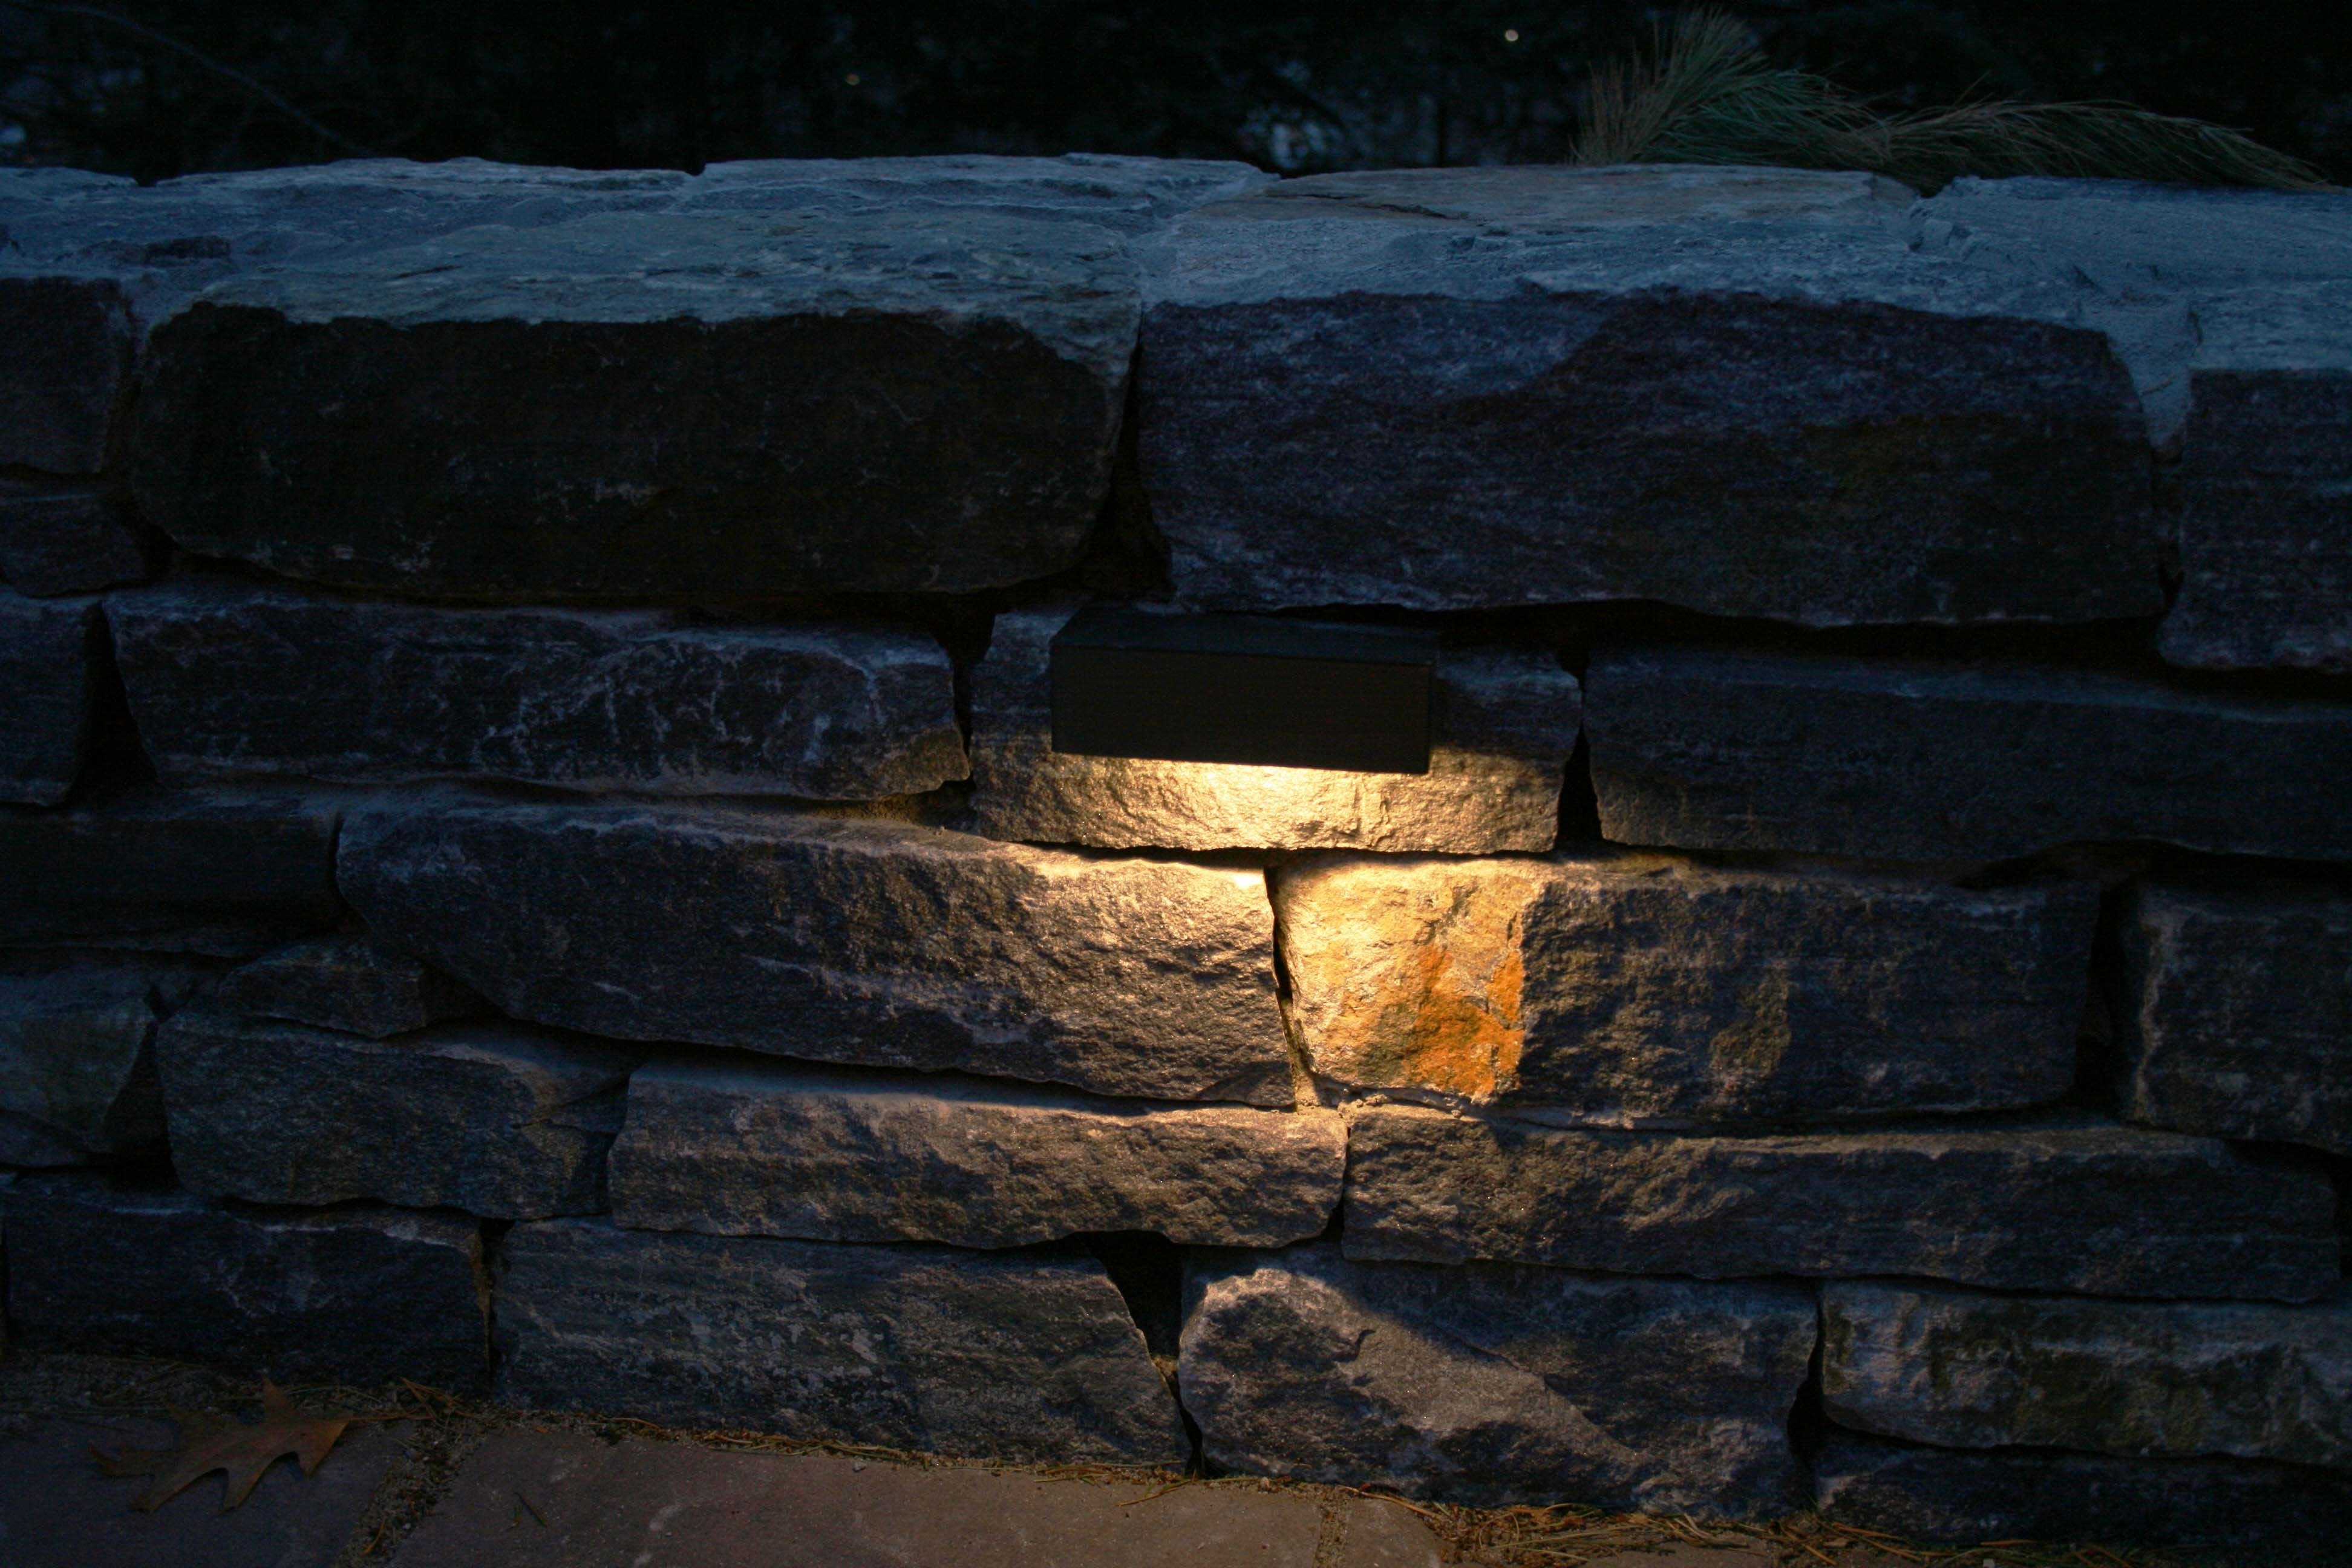 Warisan Lighting Regarding Outdoor Stone Wall Lighting (View 14 of 20)